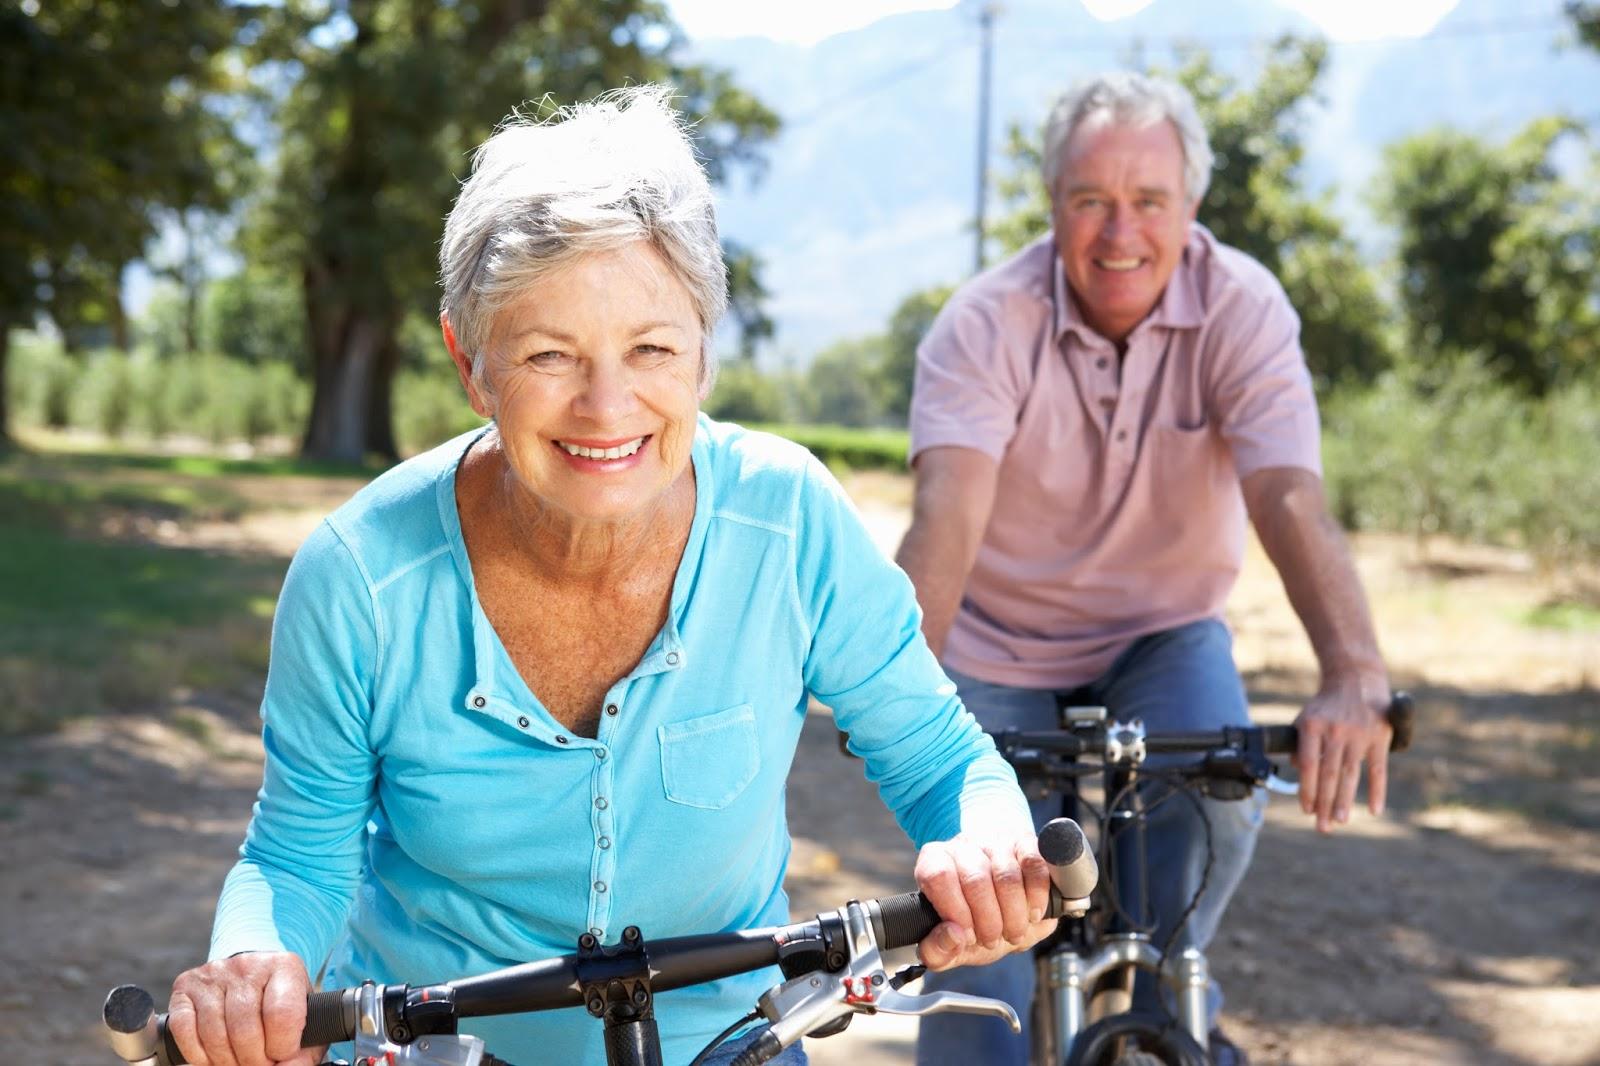 Older couple enjoying a bike ride